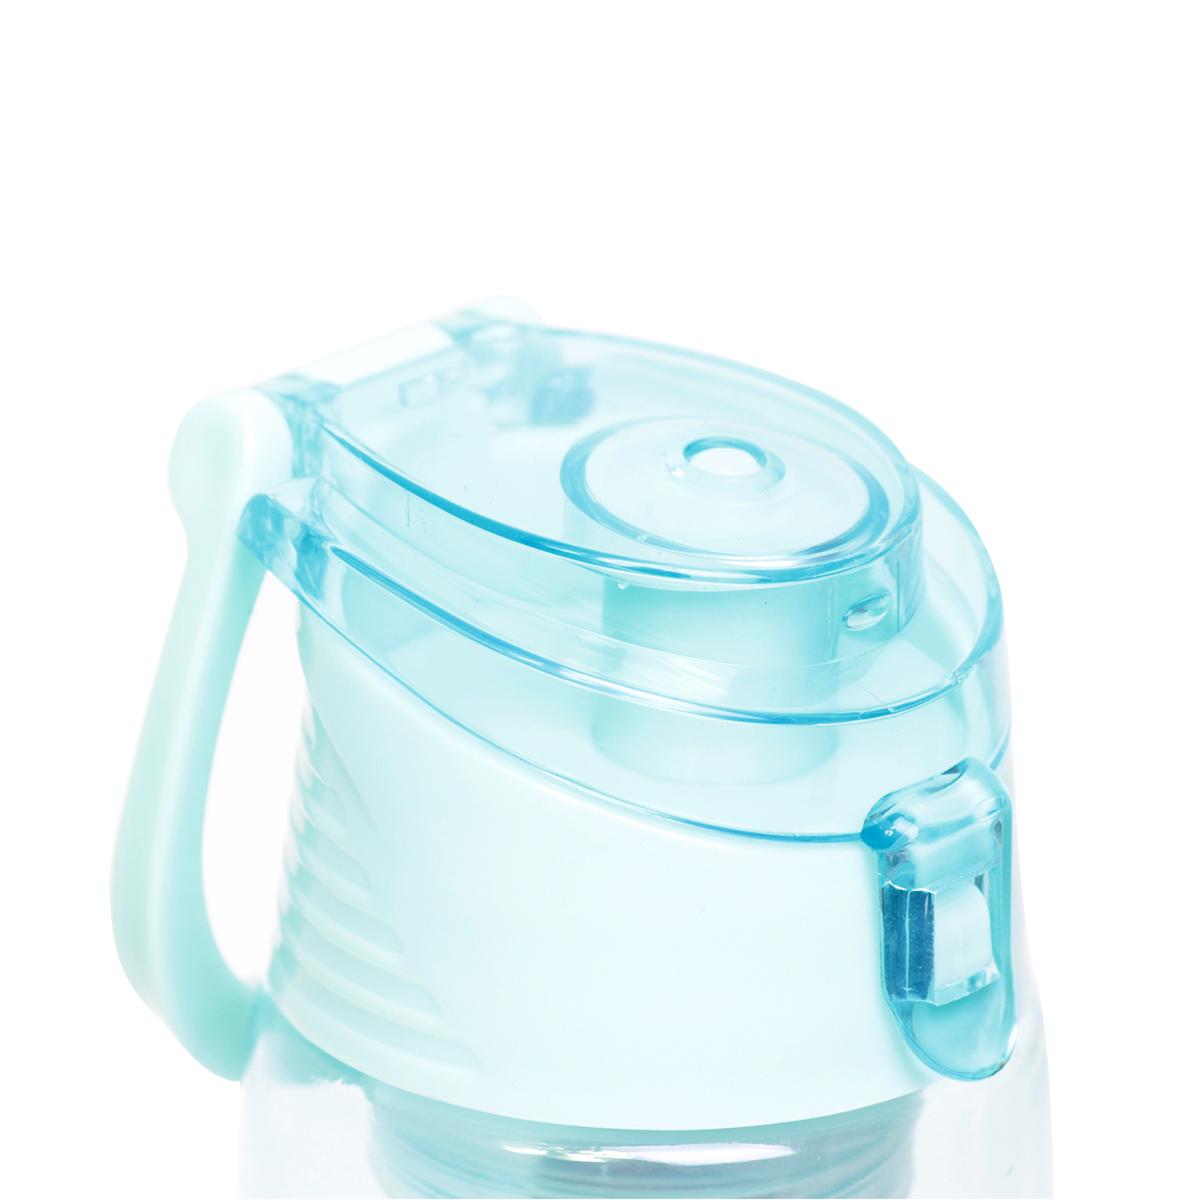 Бутылка для воды с ситечком 660 мл. Kamille голубая